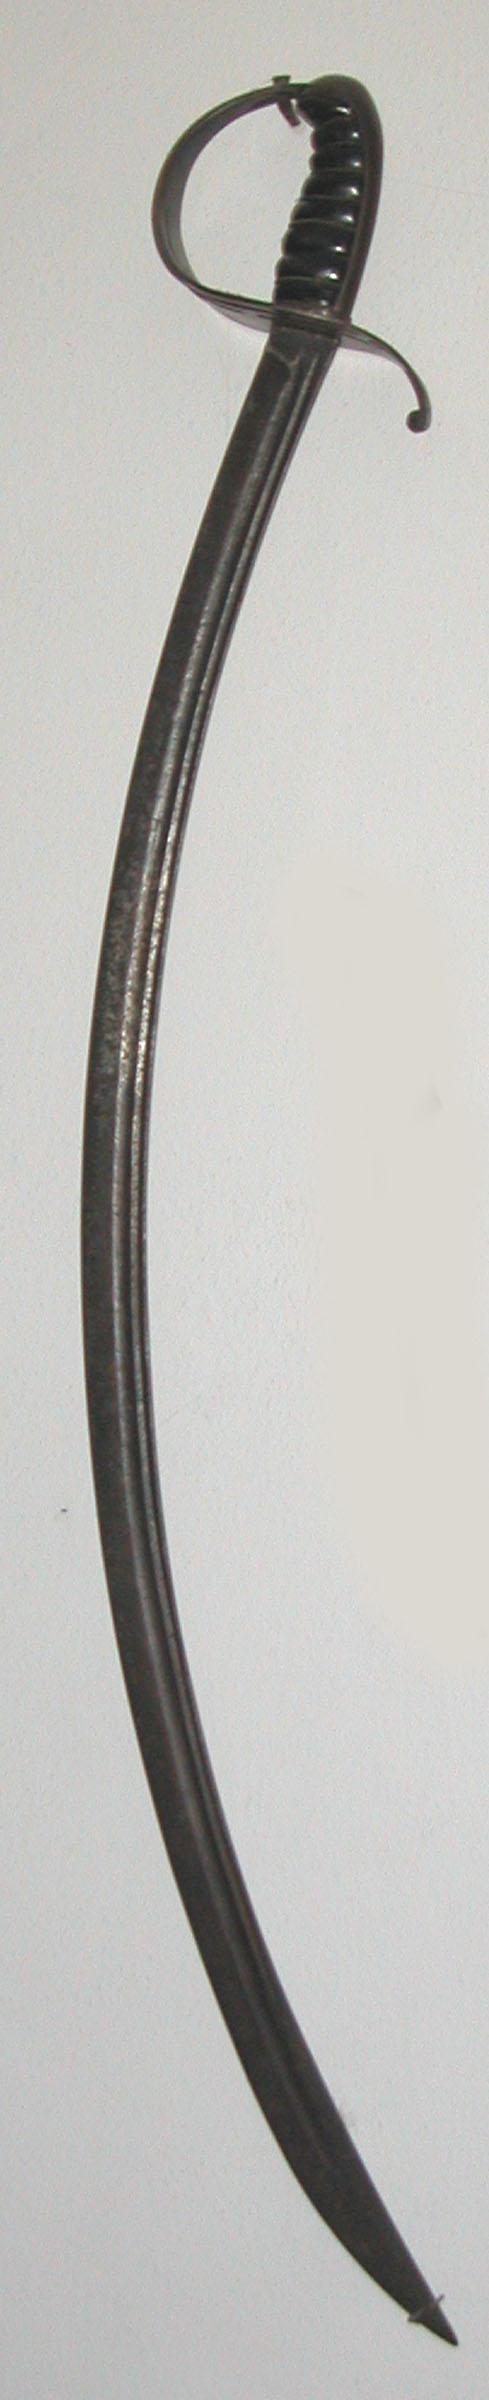 Figure 87